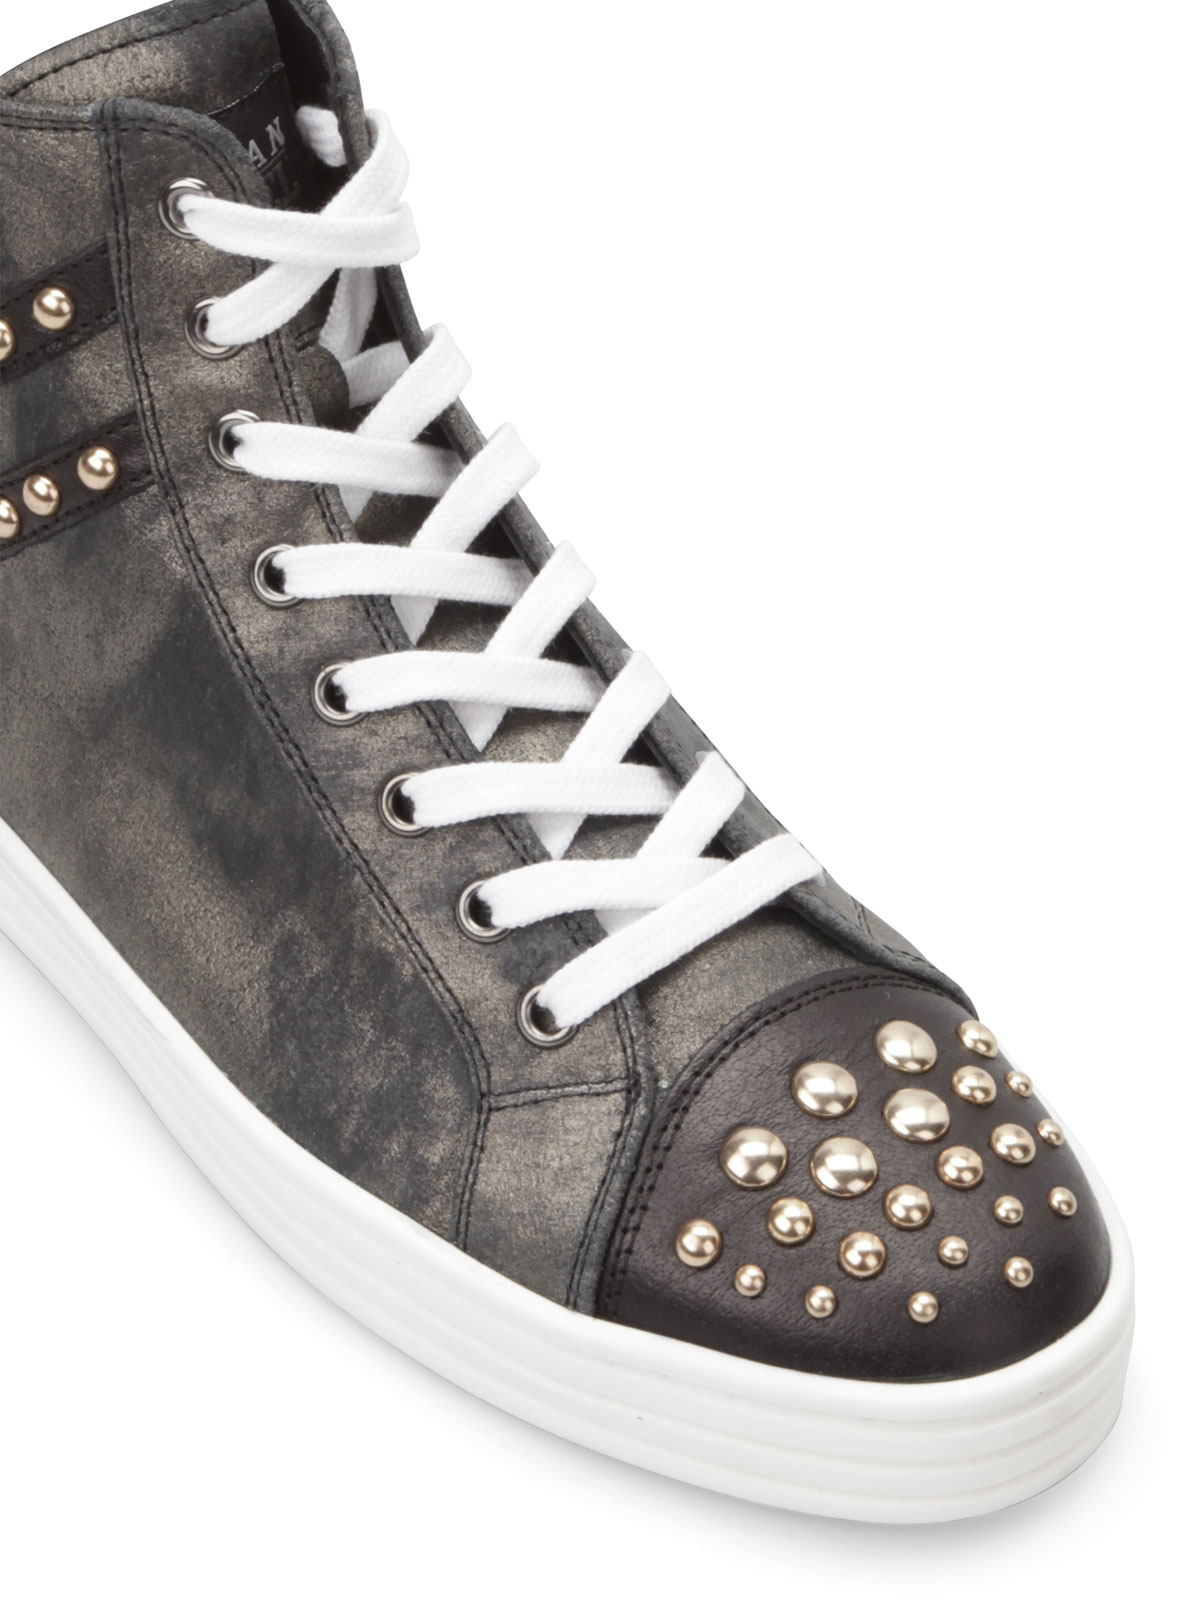 scarpe hogan outlet barberino